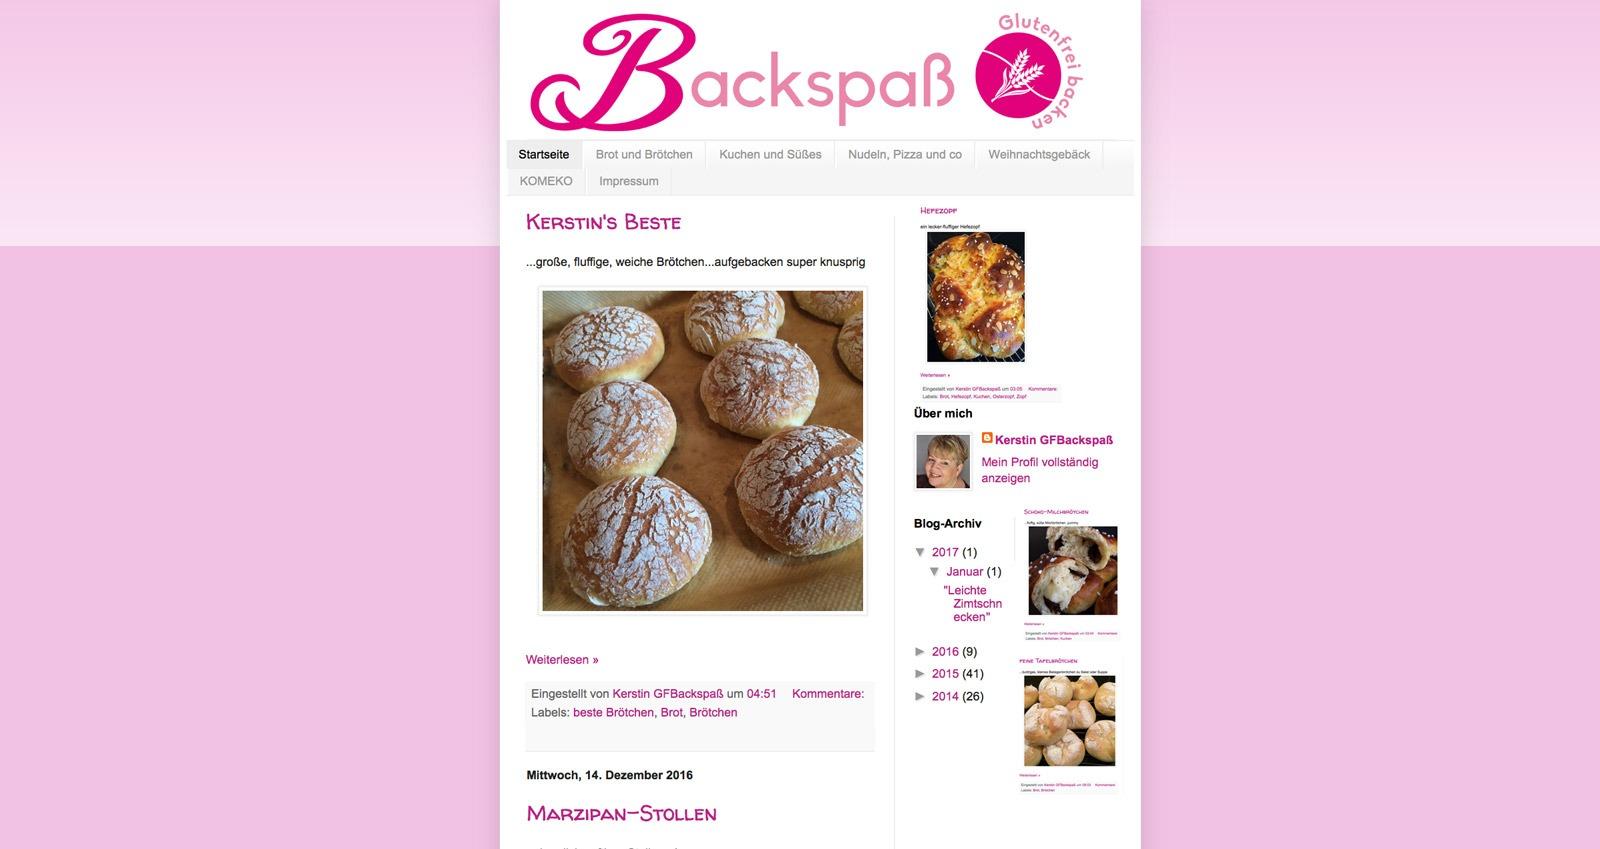 GFBackspass-Blog